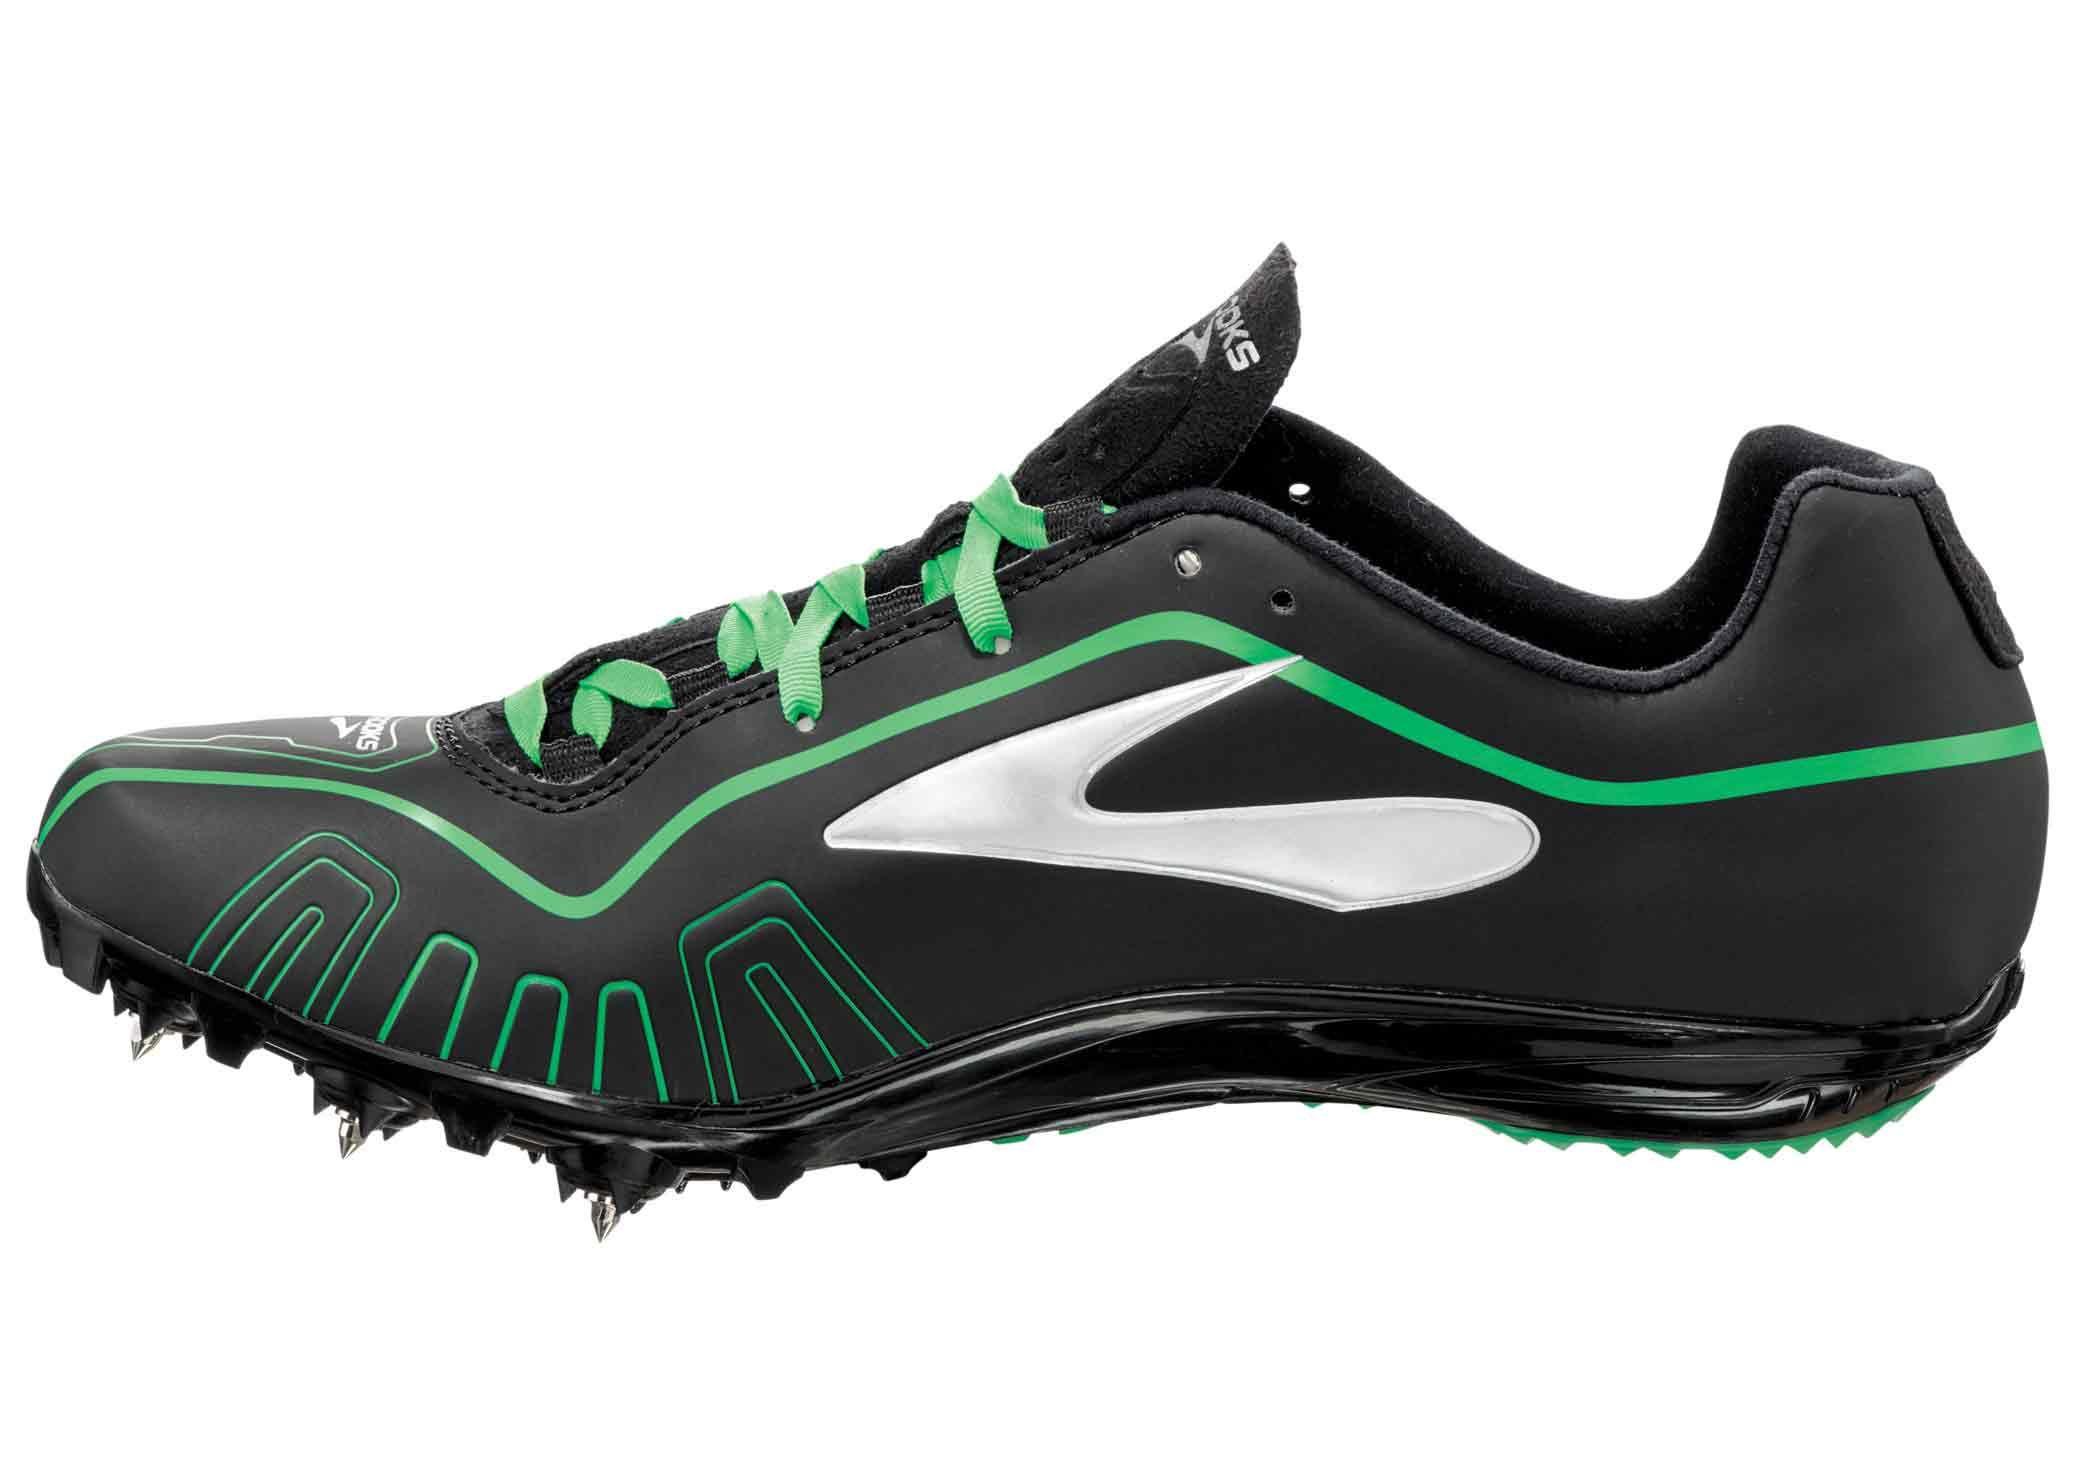 brooks running spikes